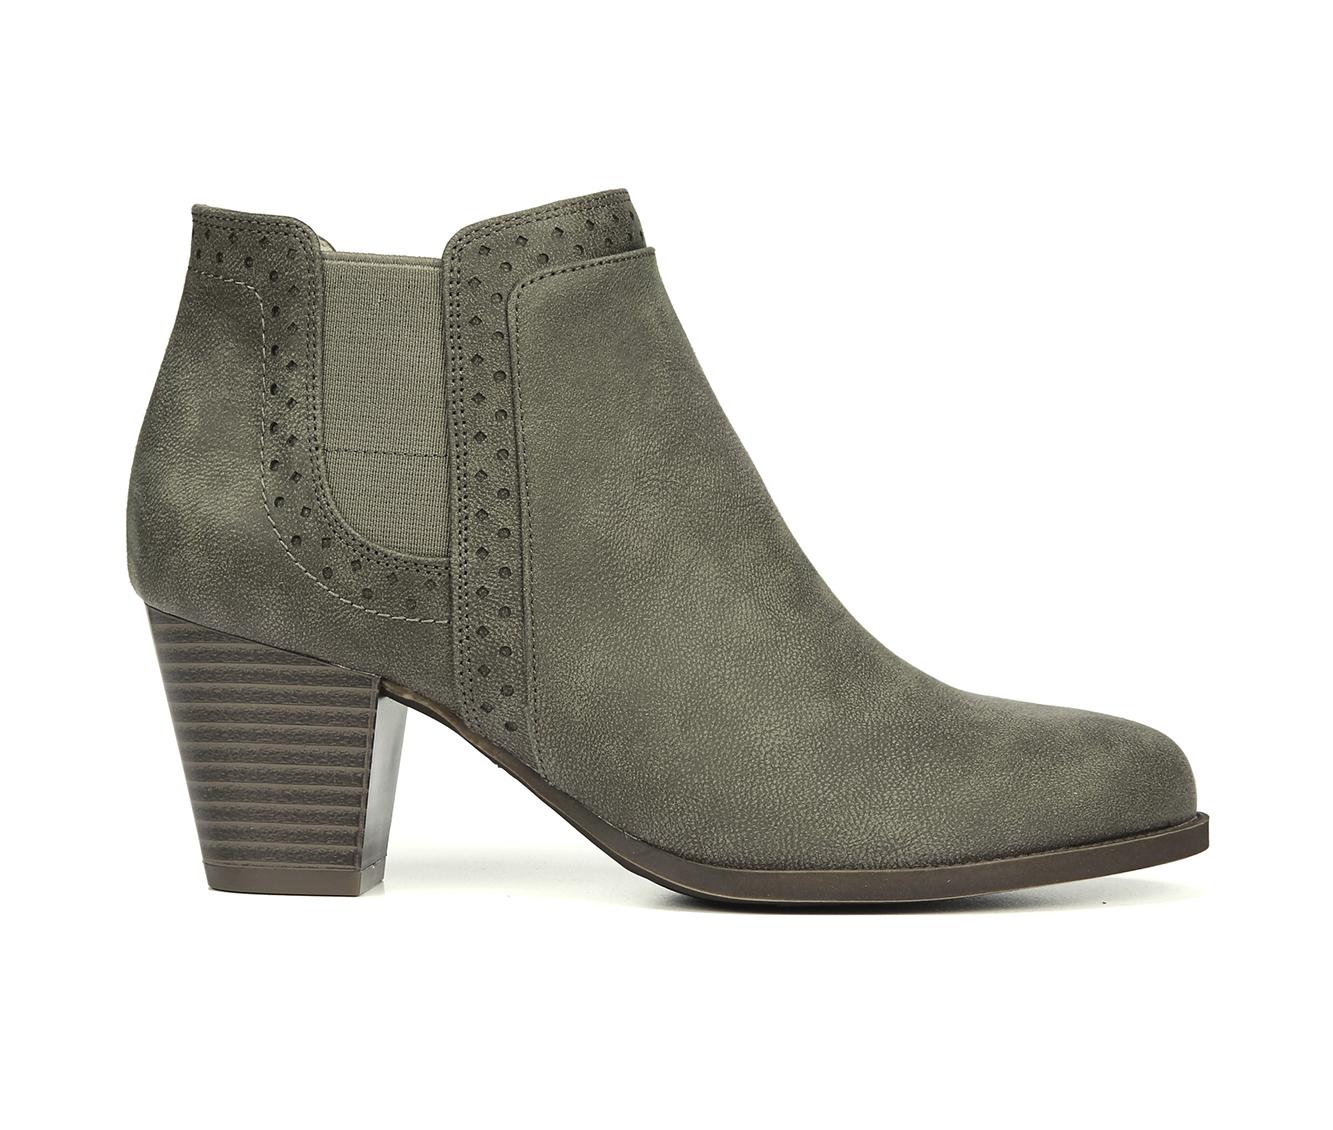 LifeStride James Women's Boots (Gray - Faux Leather)